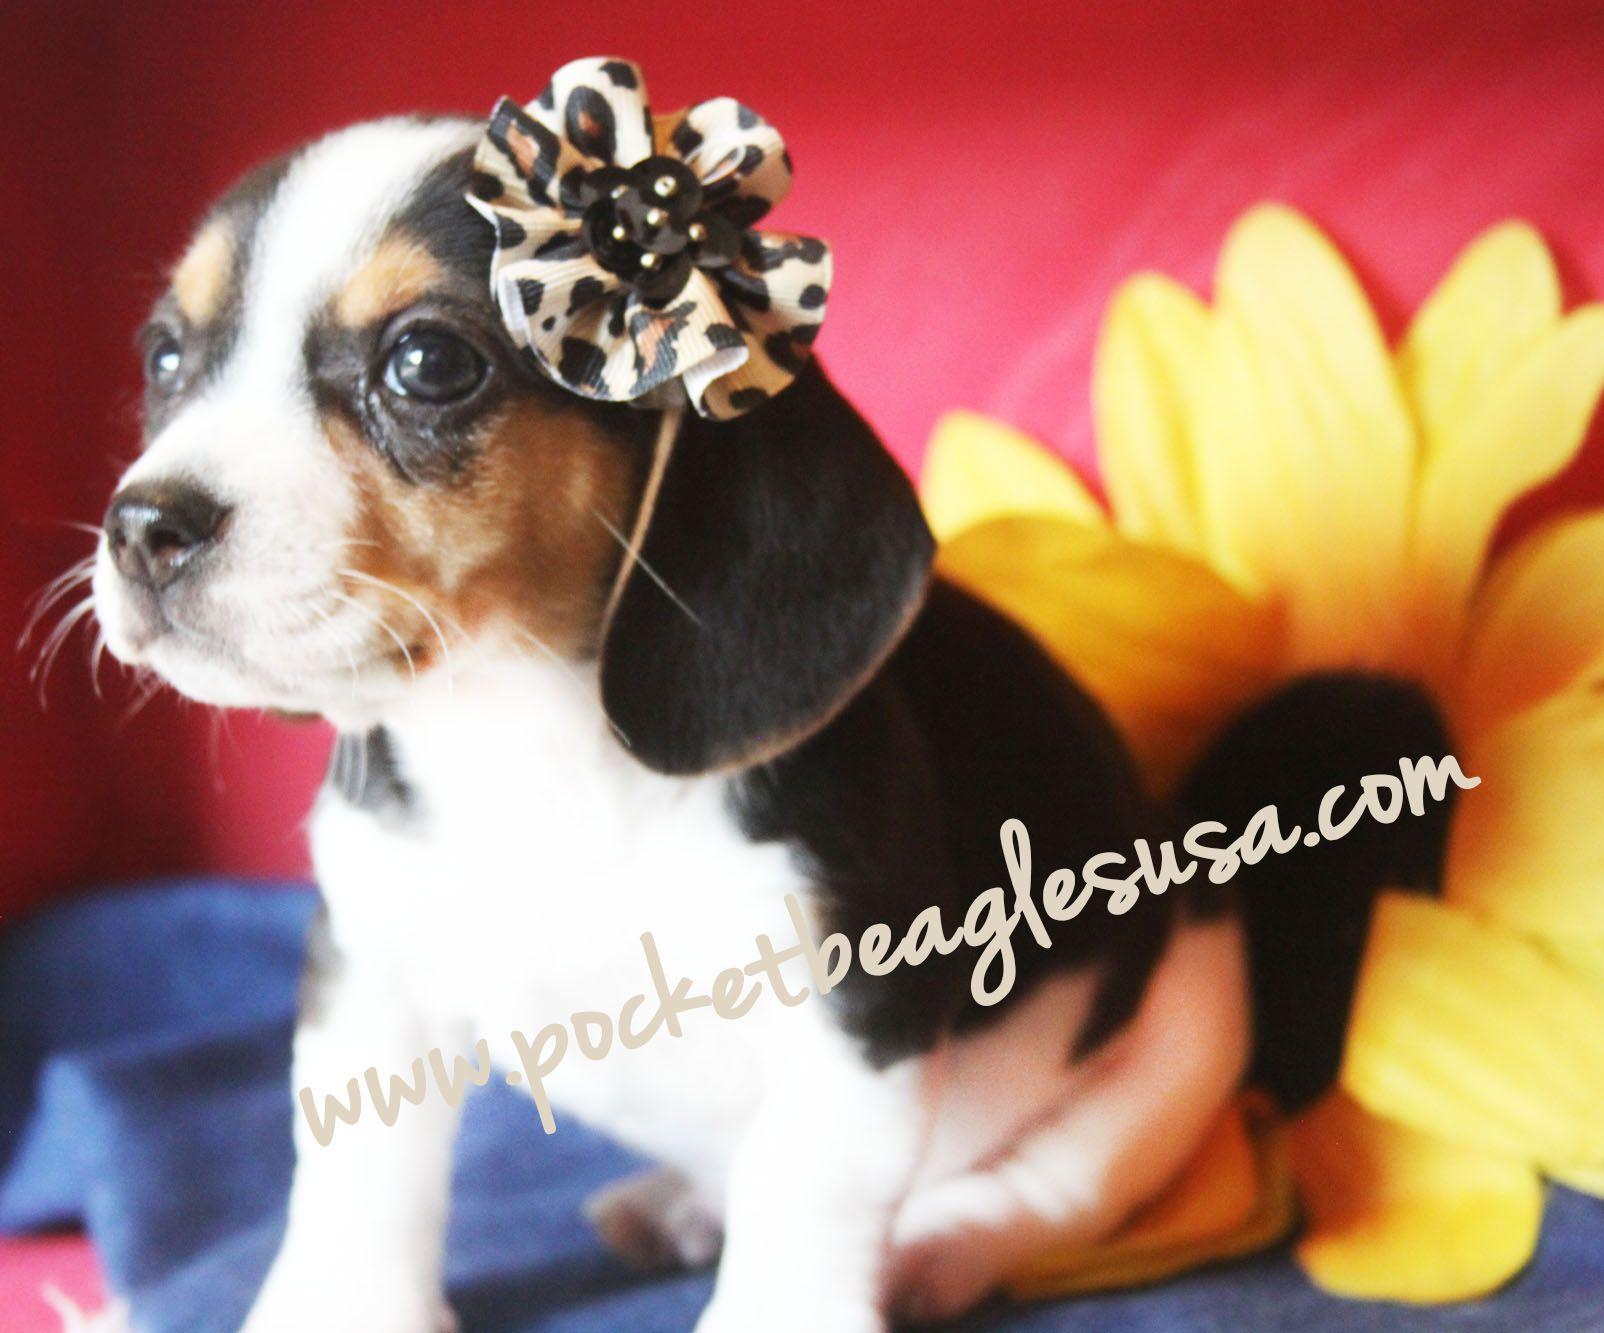 Www Pocketbeaglesusa Com Small Pocket Size Beagles Tiny Beagles